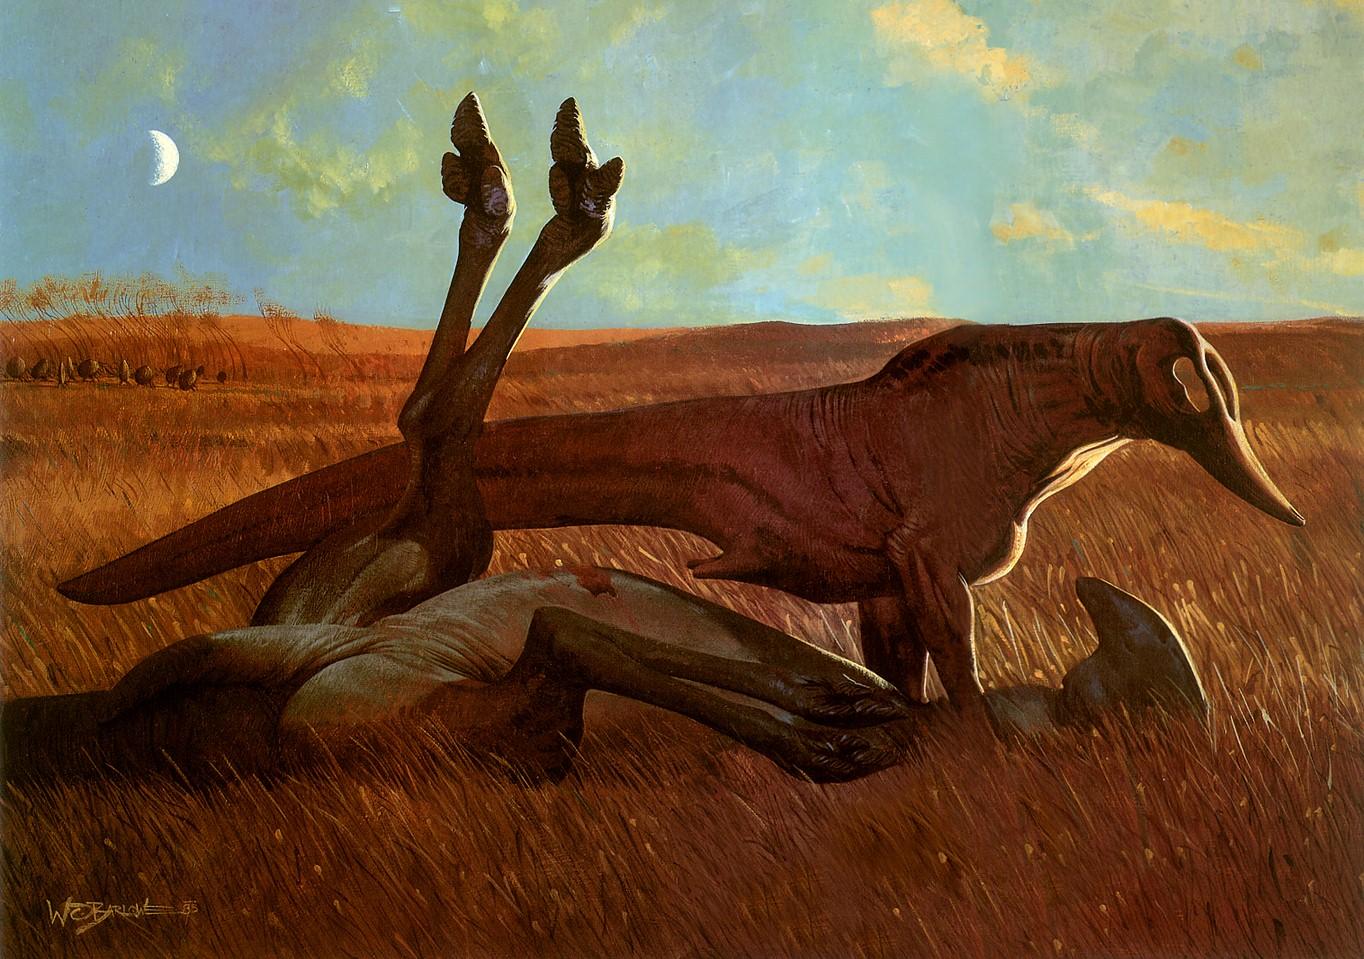 Image Am Wayne Barlowe Prairie Ramjpg Alien Species Fandom Powered By Wikia